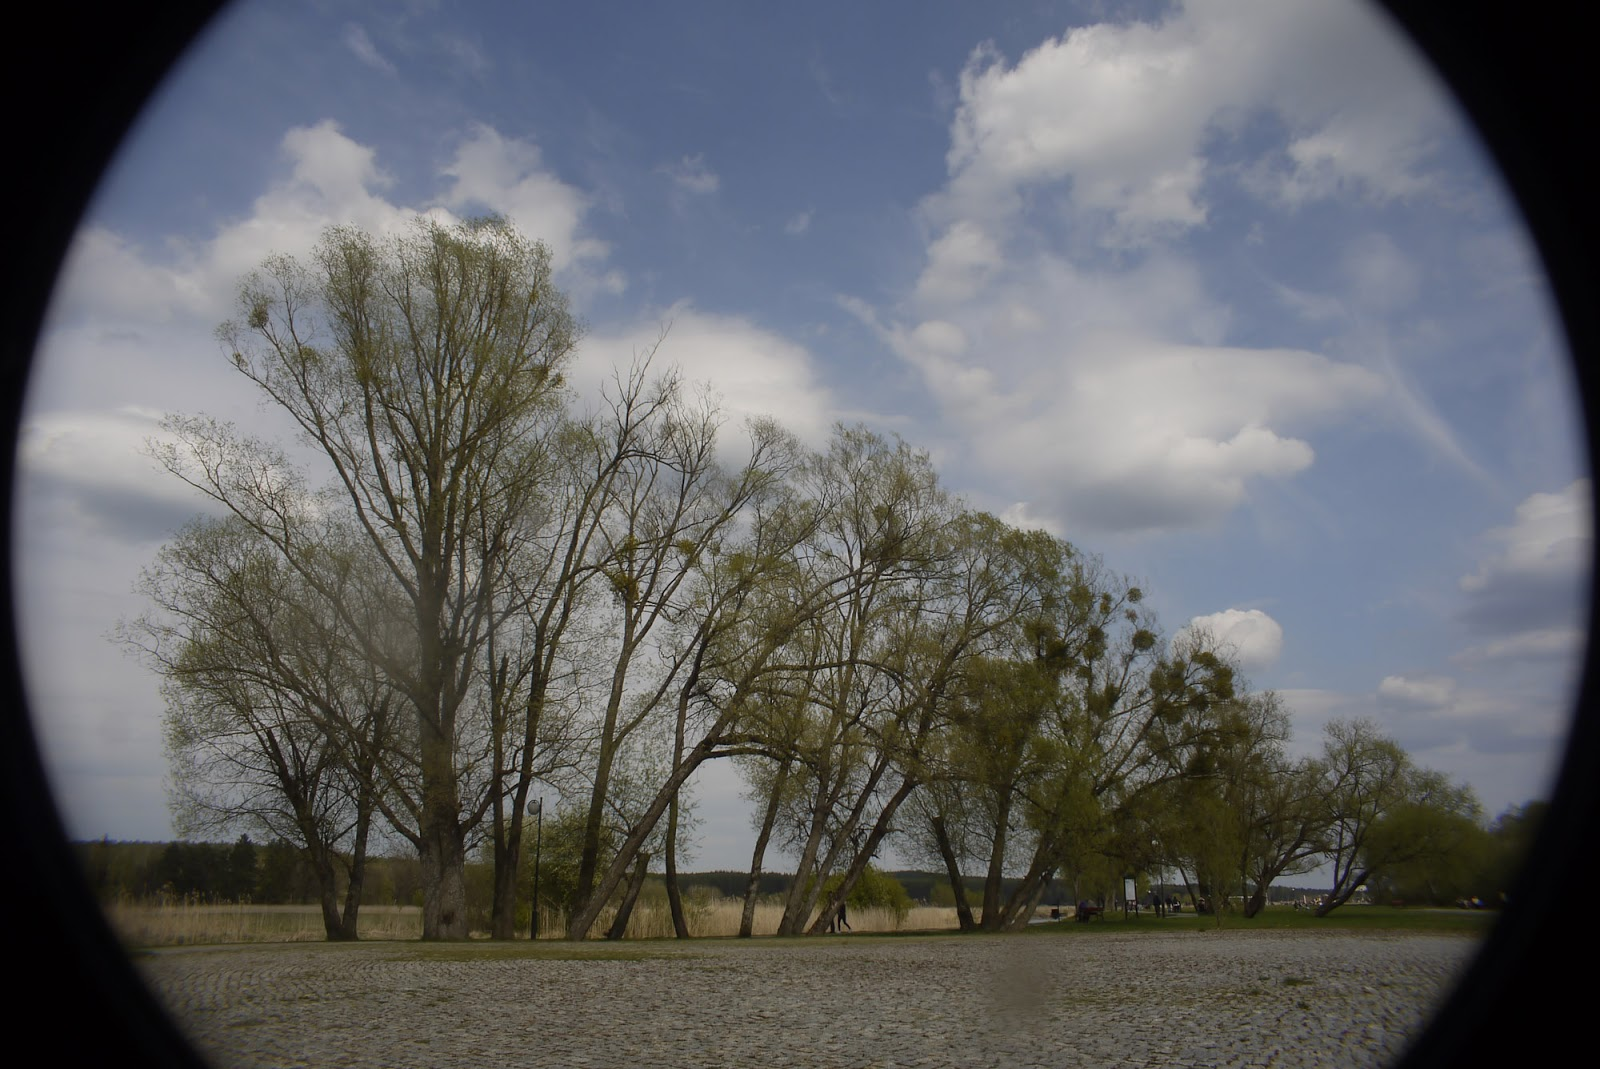 Cosmicar 12.5/1.9 @16 - landscape (2:3 crop).